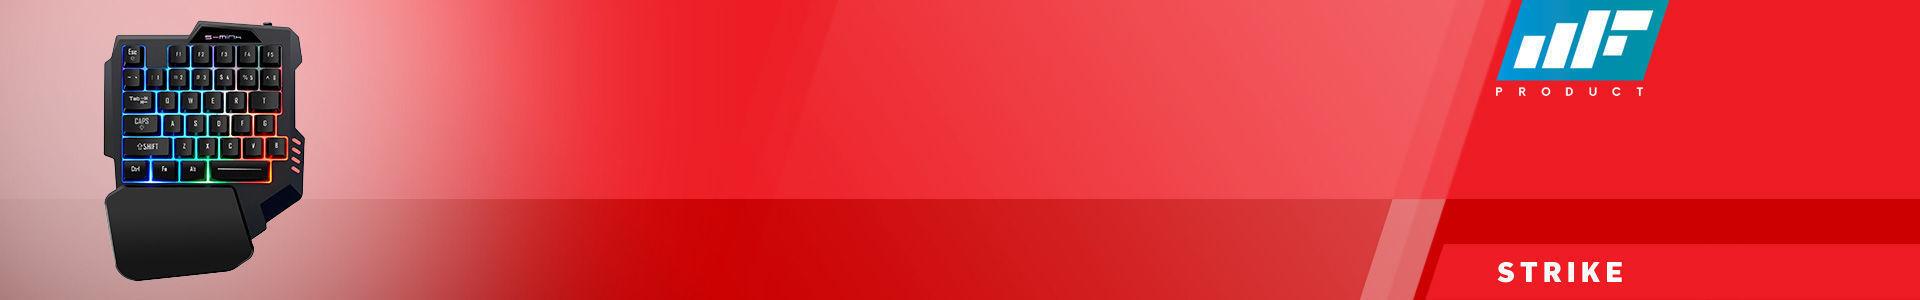 MF Product Strike 0568 RGB Kablolu Tek El Mini Oyun Klavyesi Siyah en iyi fiyata stokta!